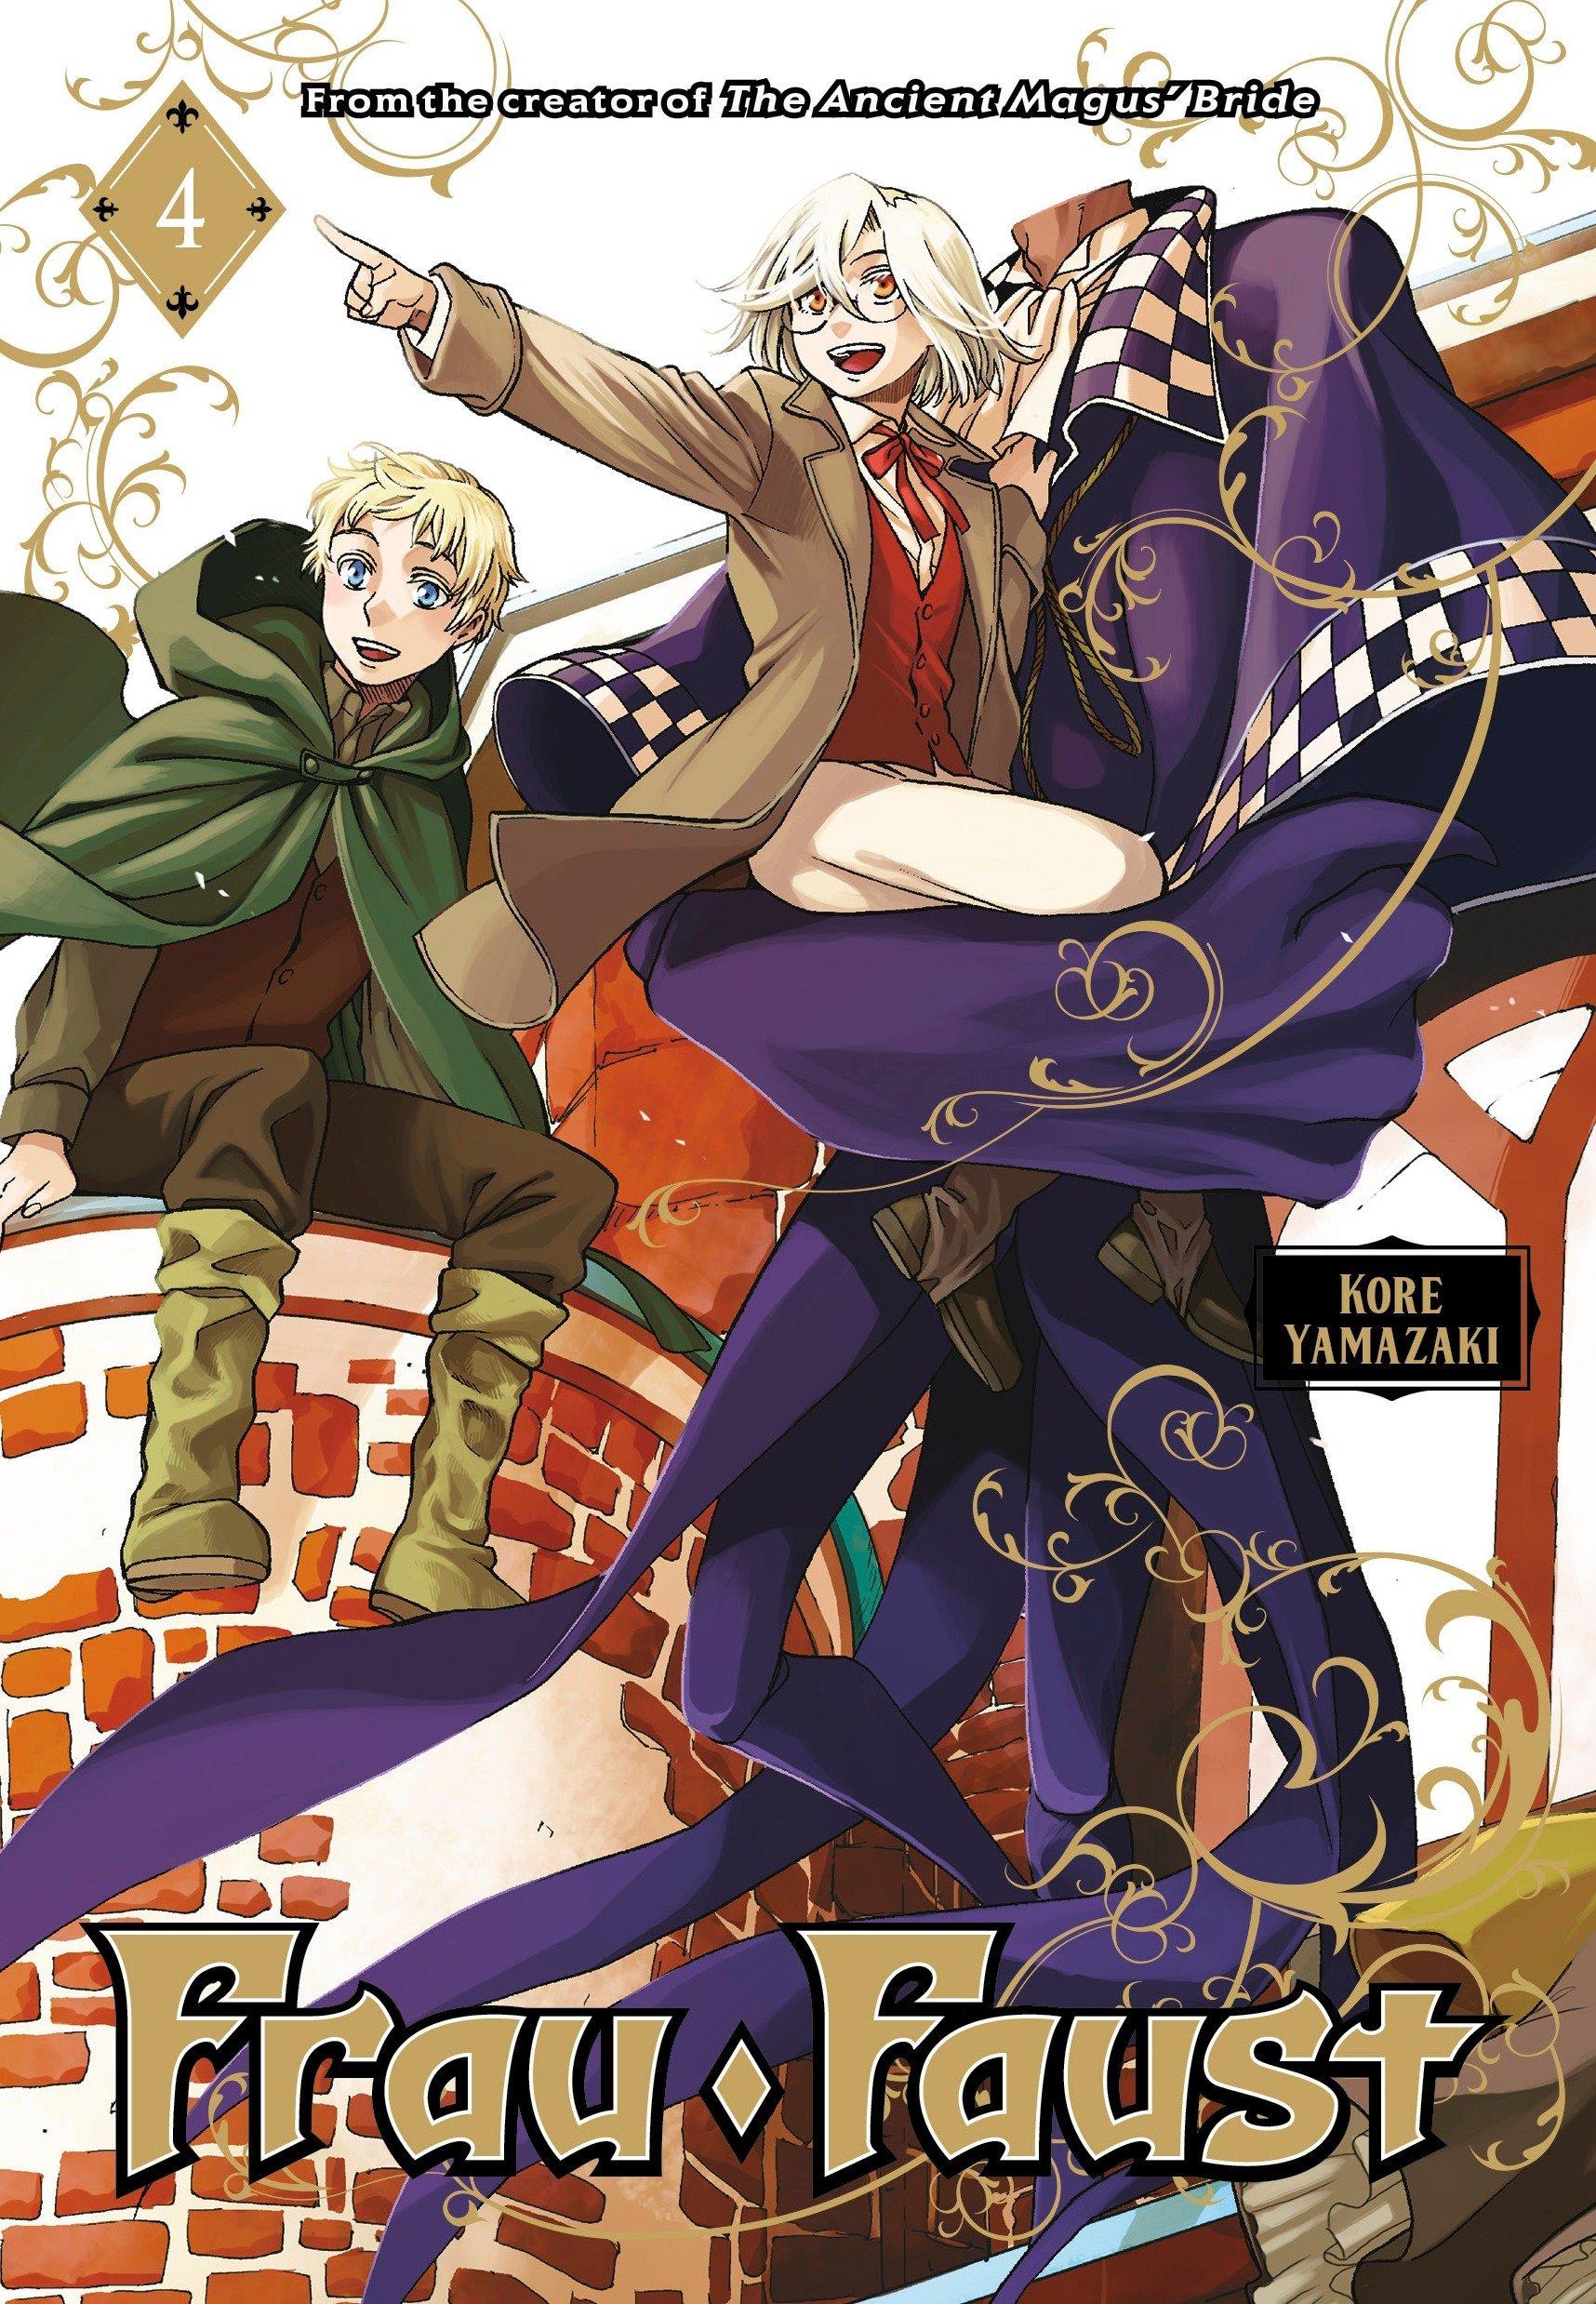 Frau Faust 4 (Inglese) Copertina flessibile – 6 mar 2018 Kore Yamazaki Kodansha Comics 1632365502 Comics & Graphic Novels